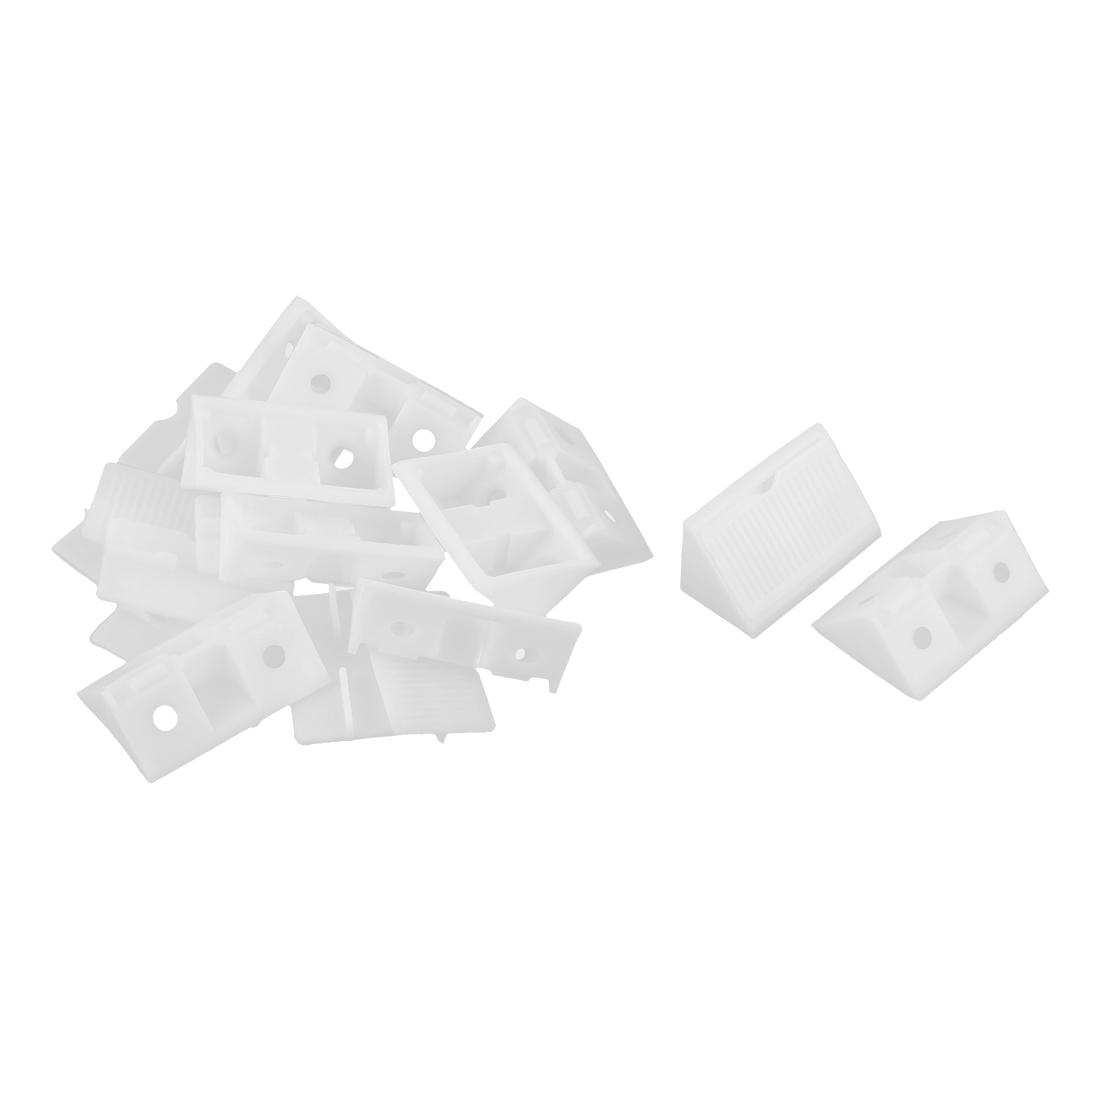 Furniture Shelf Cabinet Plastic 90 Degree Angle Brackets White 10pcs